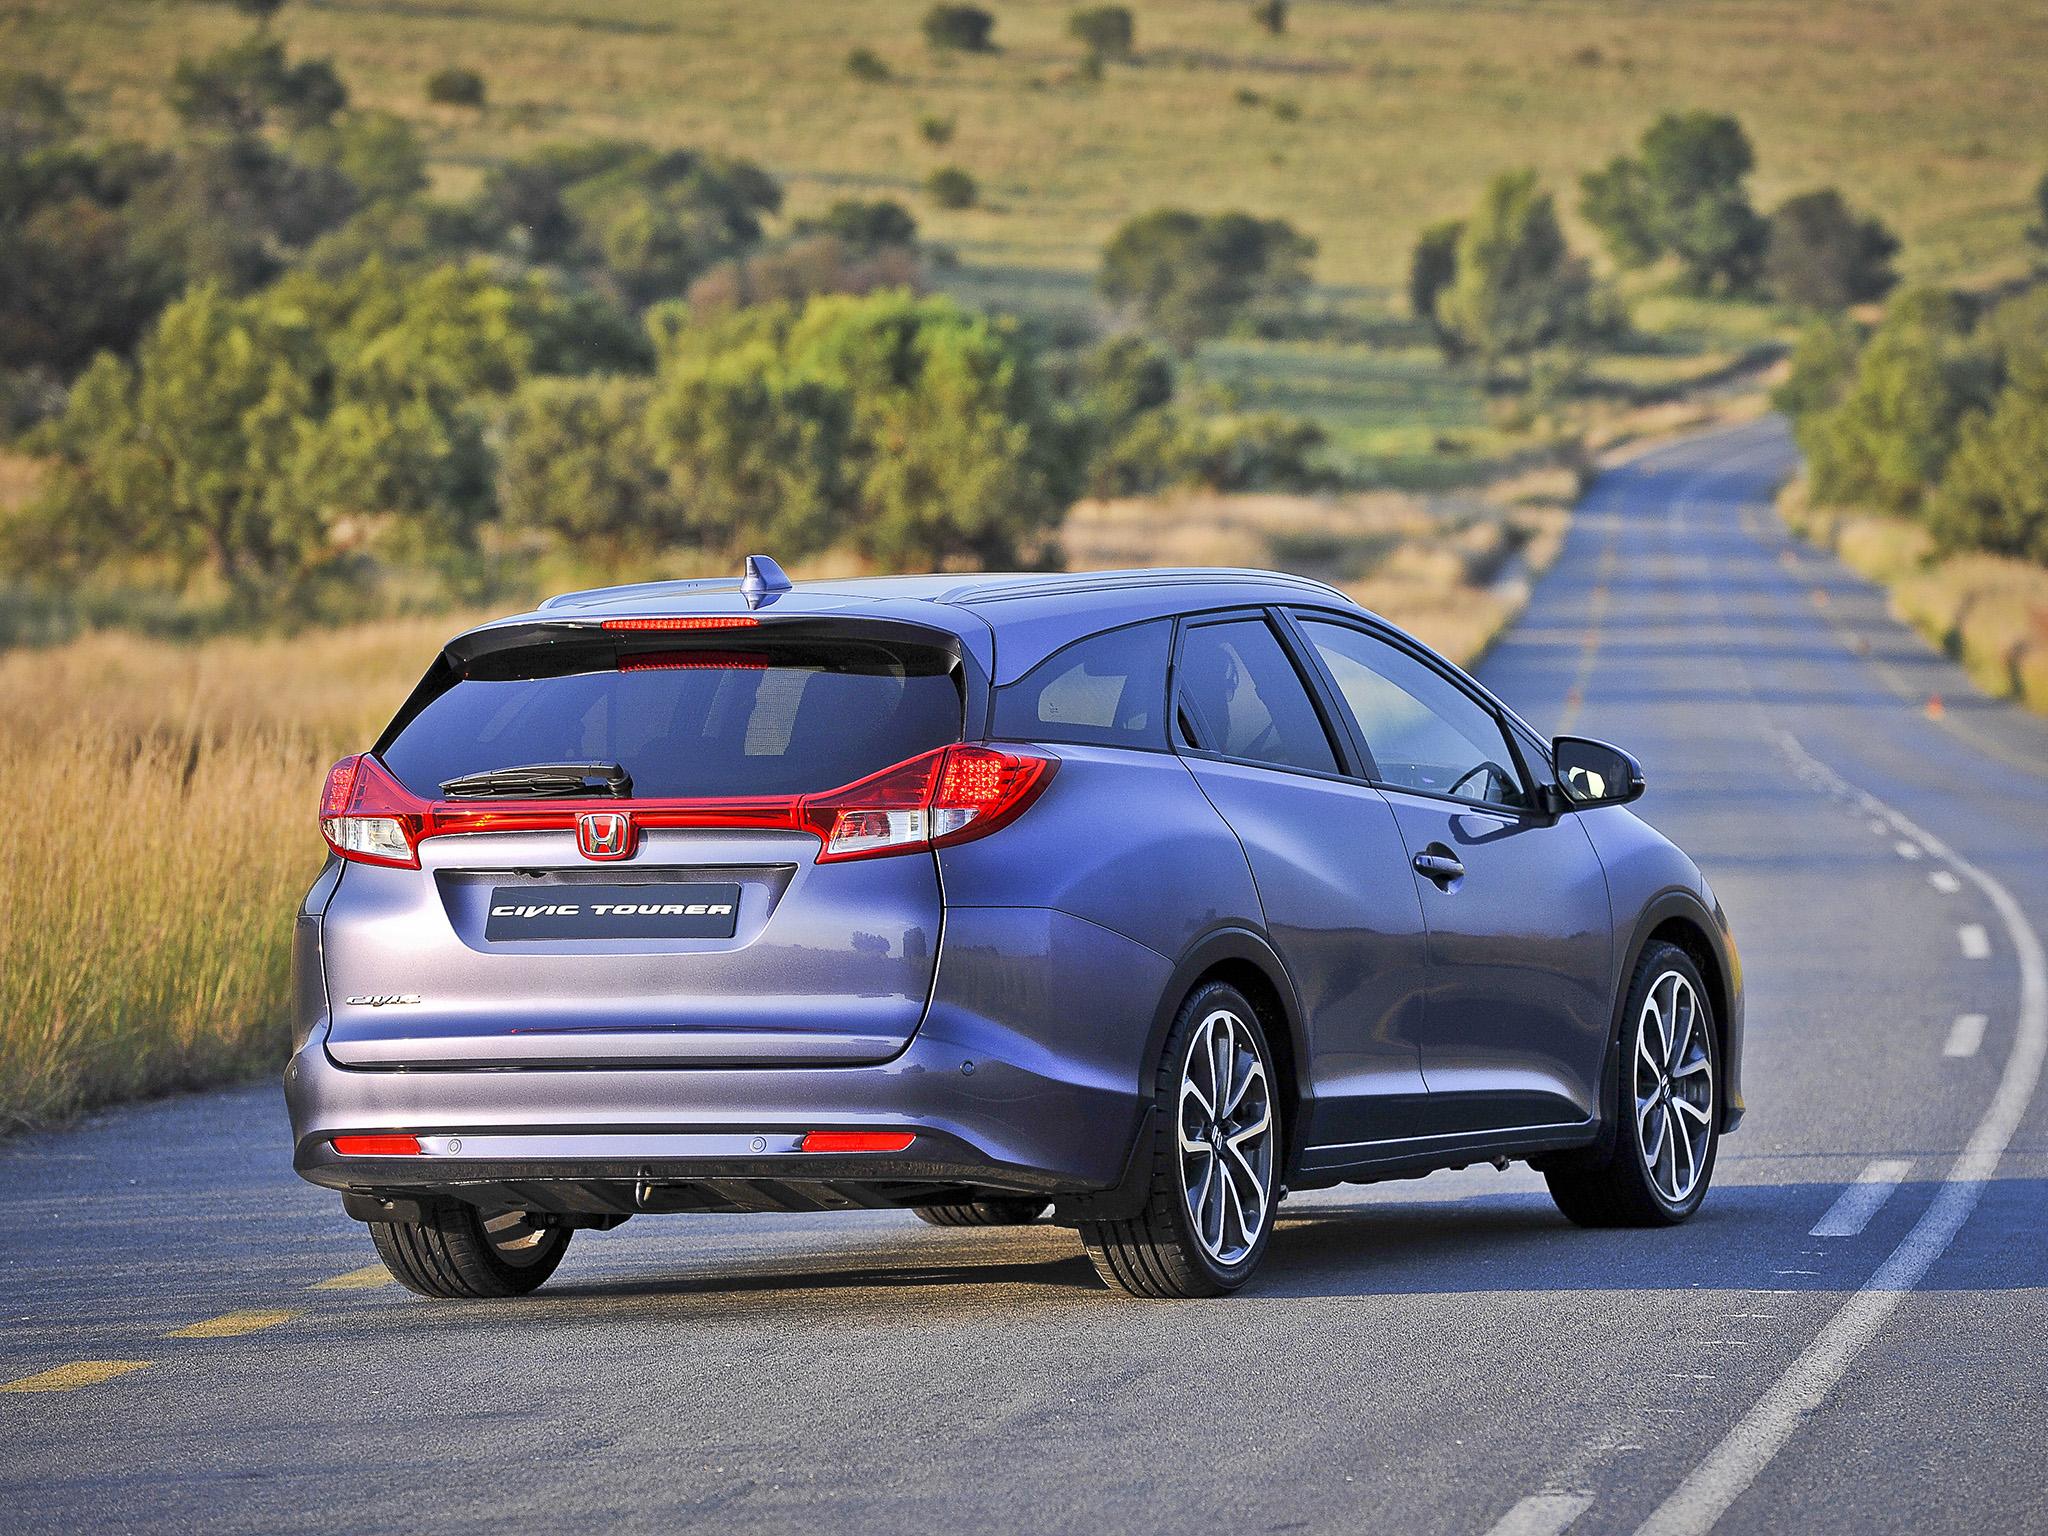 Honda Civic Tourer Arrives in South Africa - autoevolution